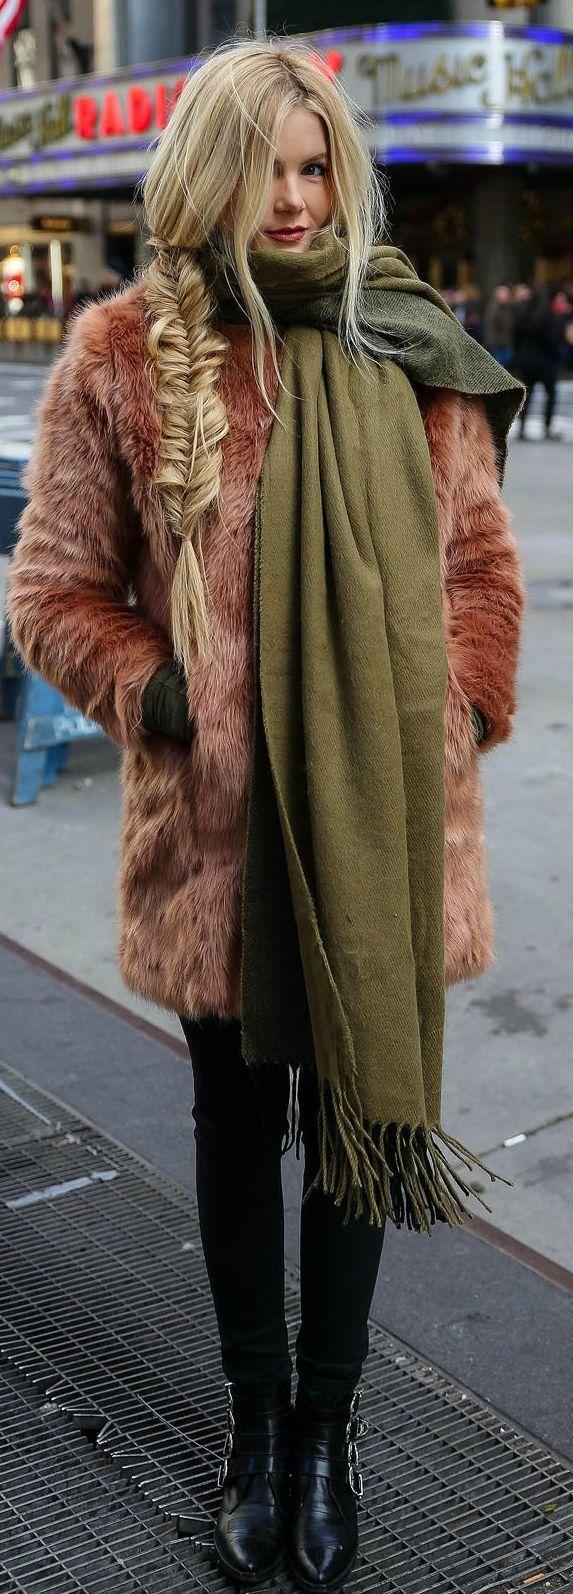 Olive Green Oversize Scarf, blush faux fur coat